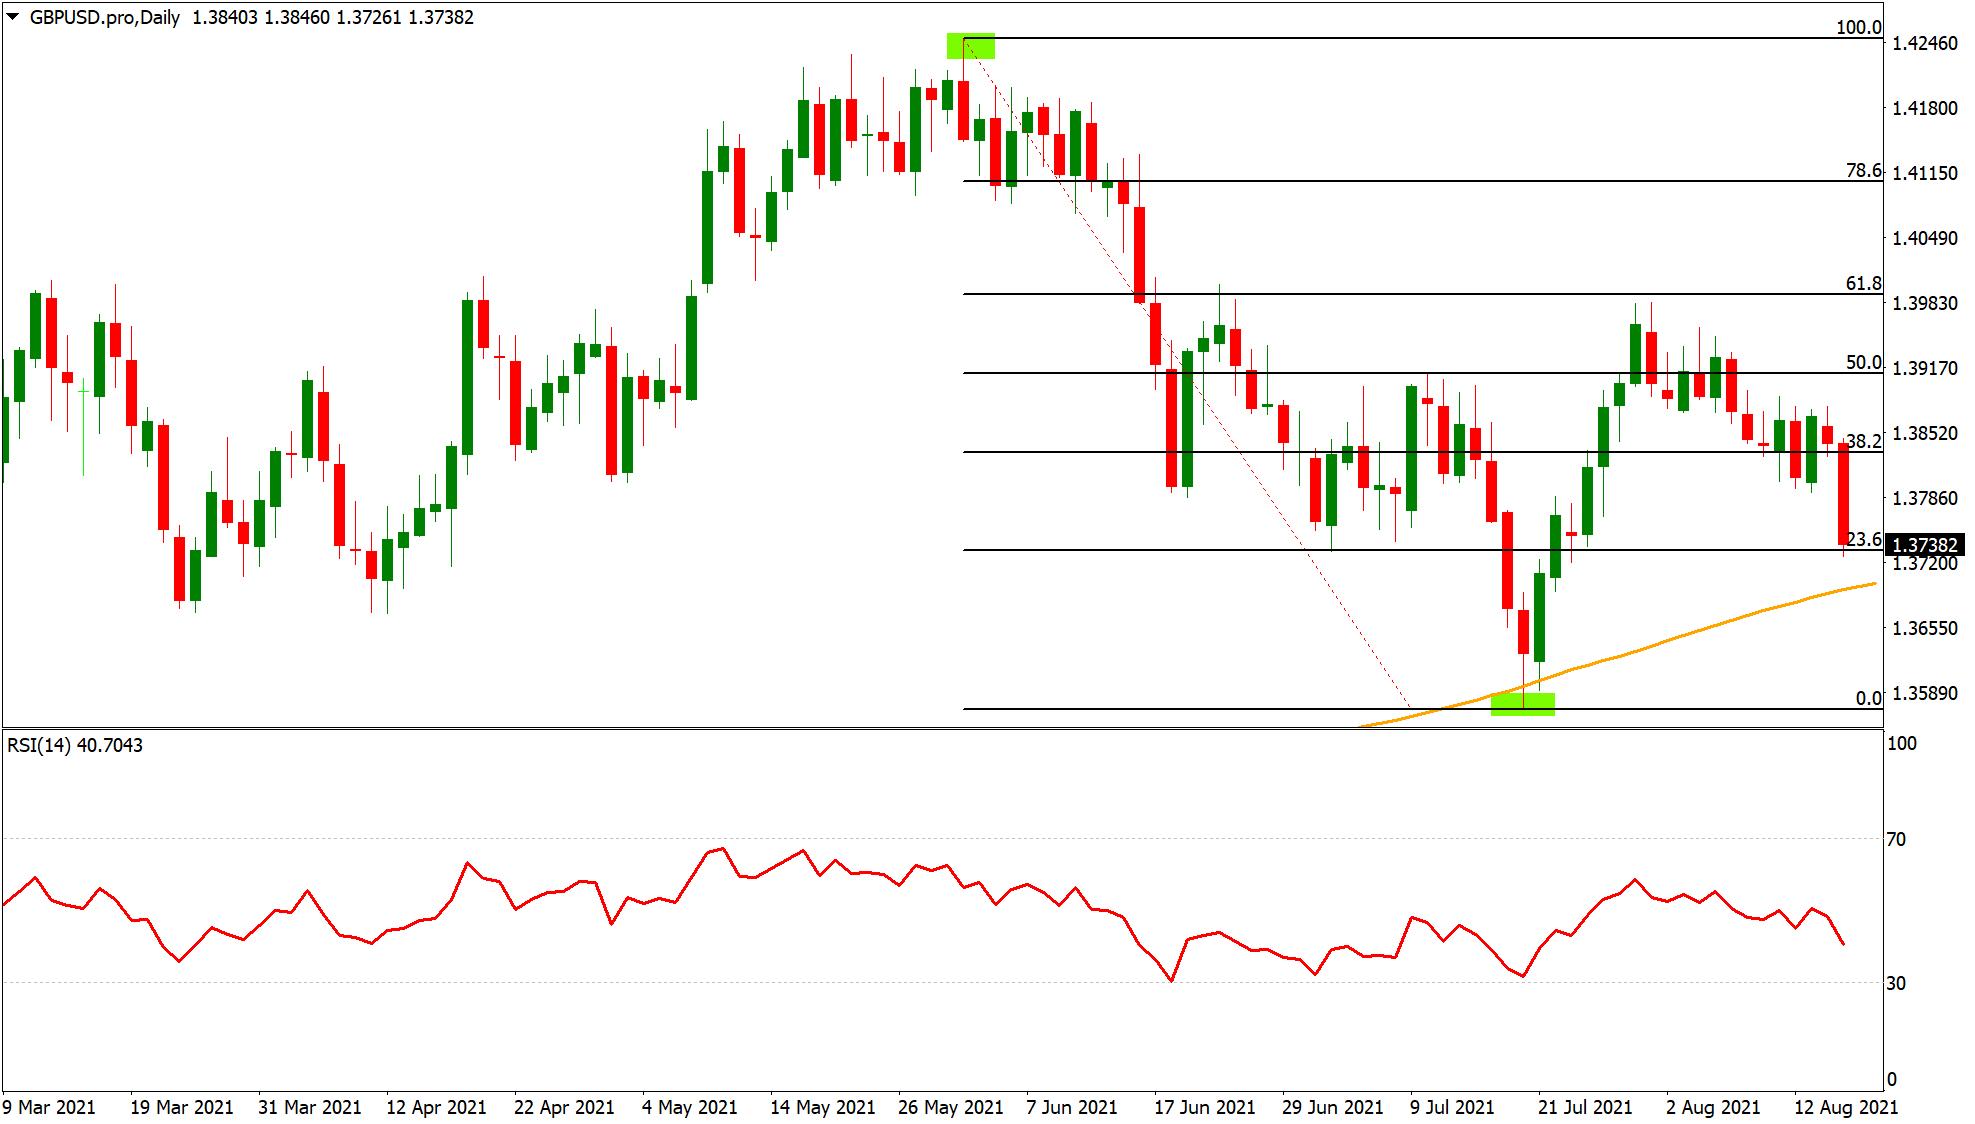 GBP/USD trading chart with Fibonacci retracement levels technical indicator